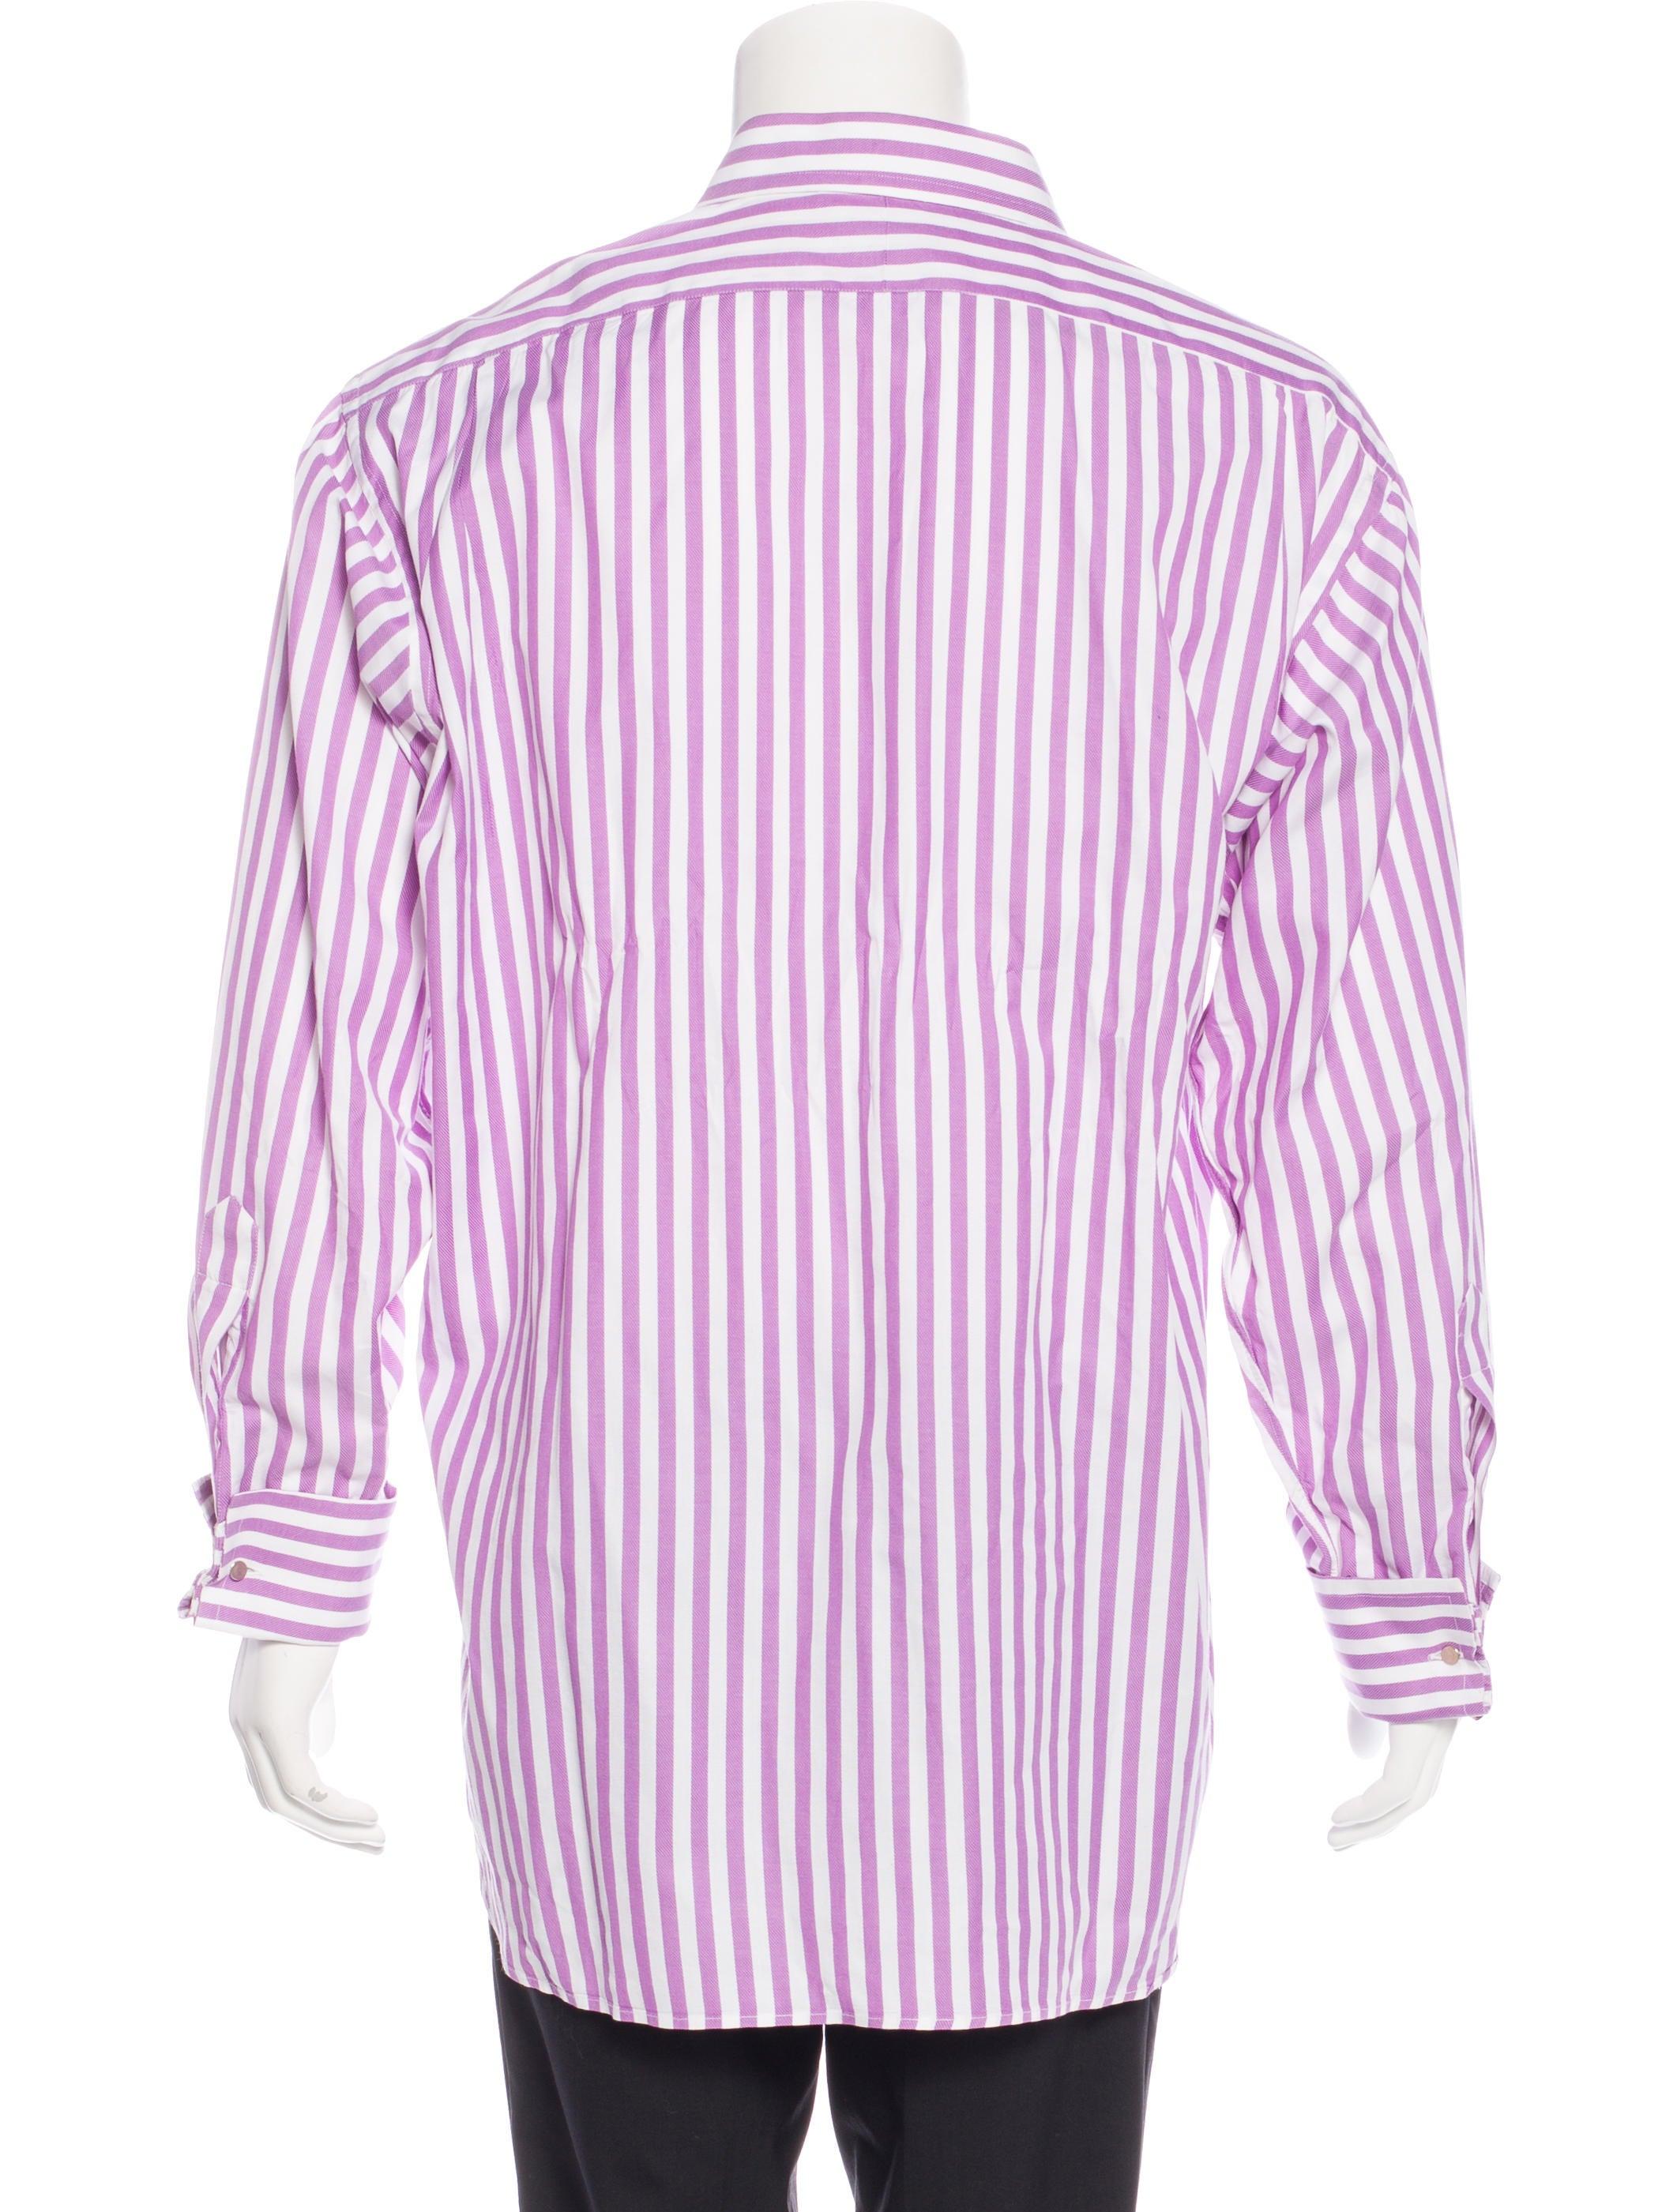 Burberry London Striped Woven Shirt Clothing